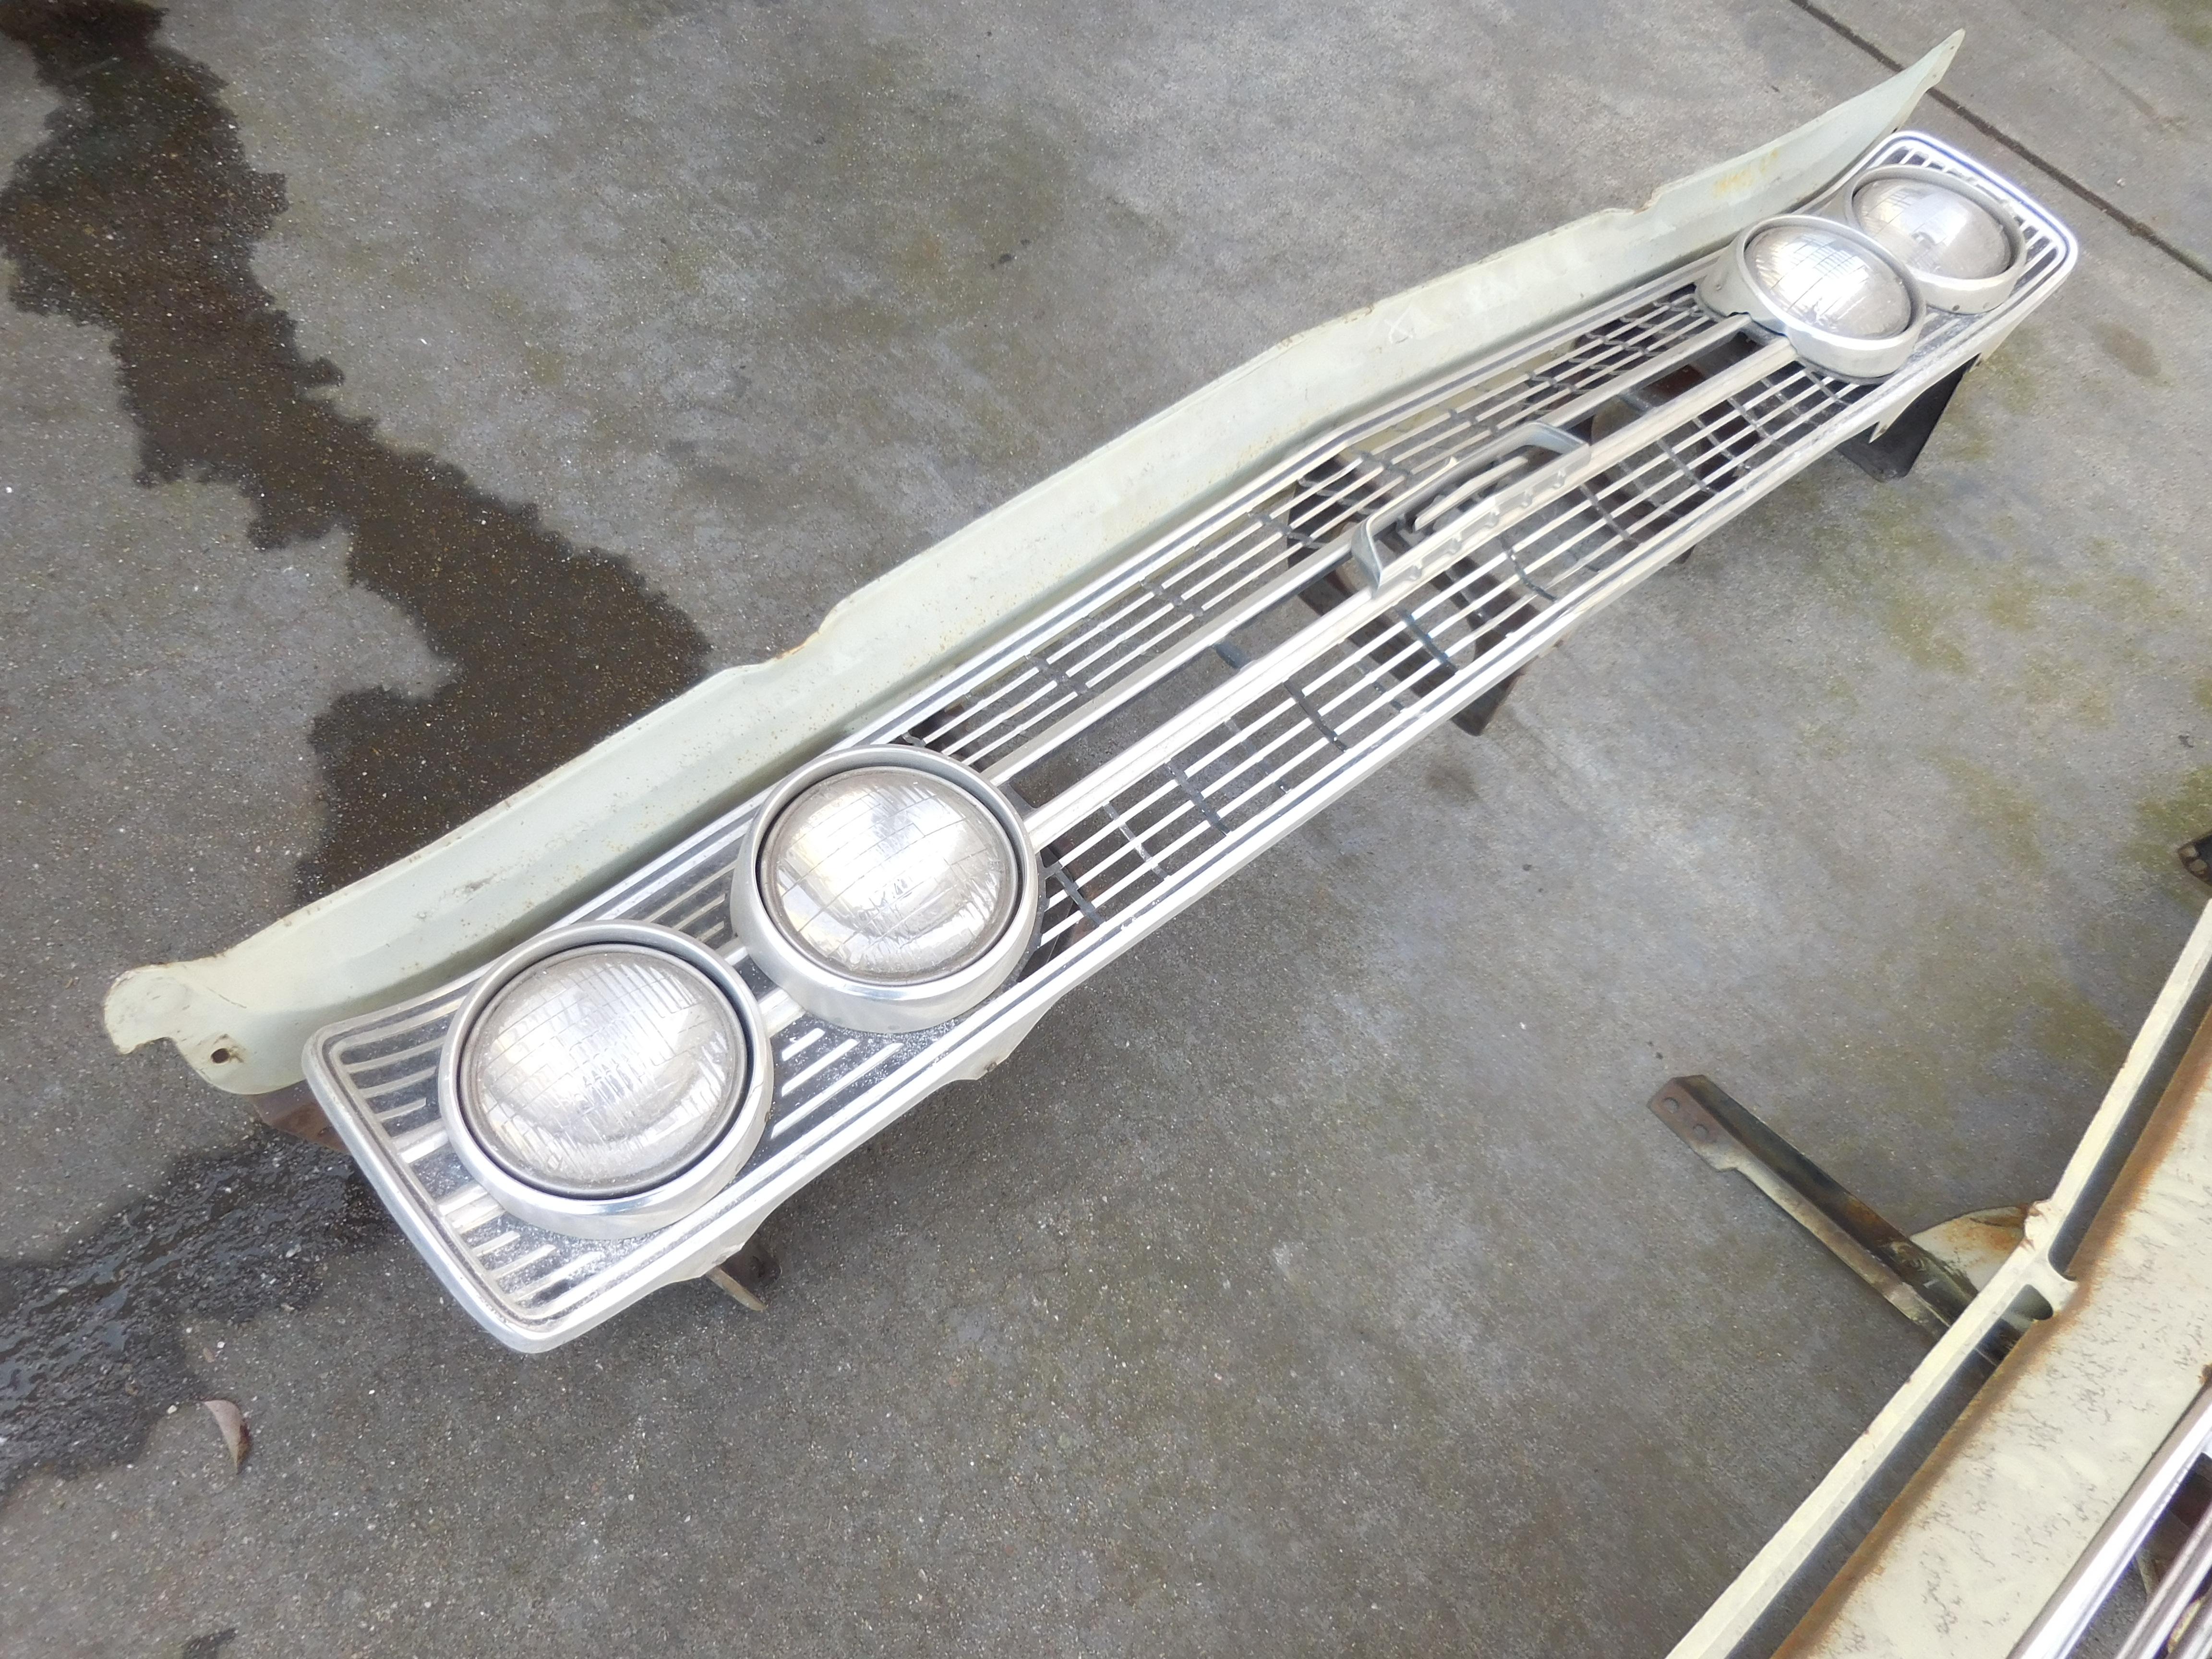 1977 -1979 Buick Electra Rear Bumper Fillers